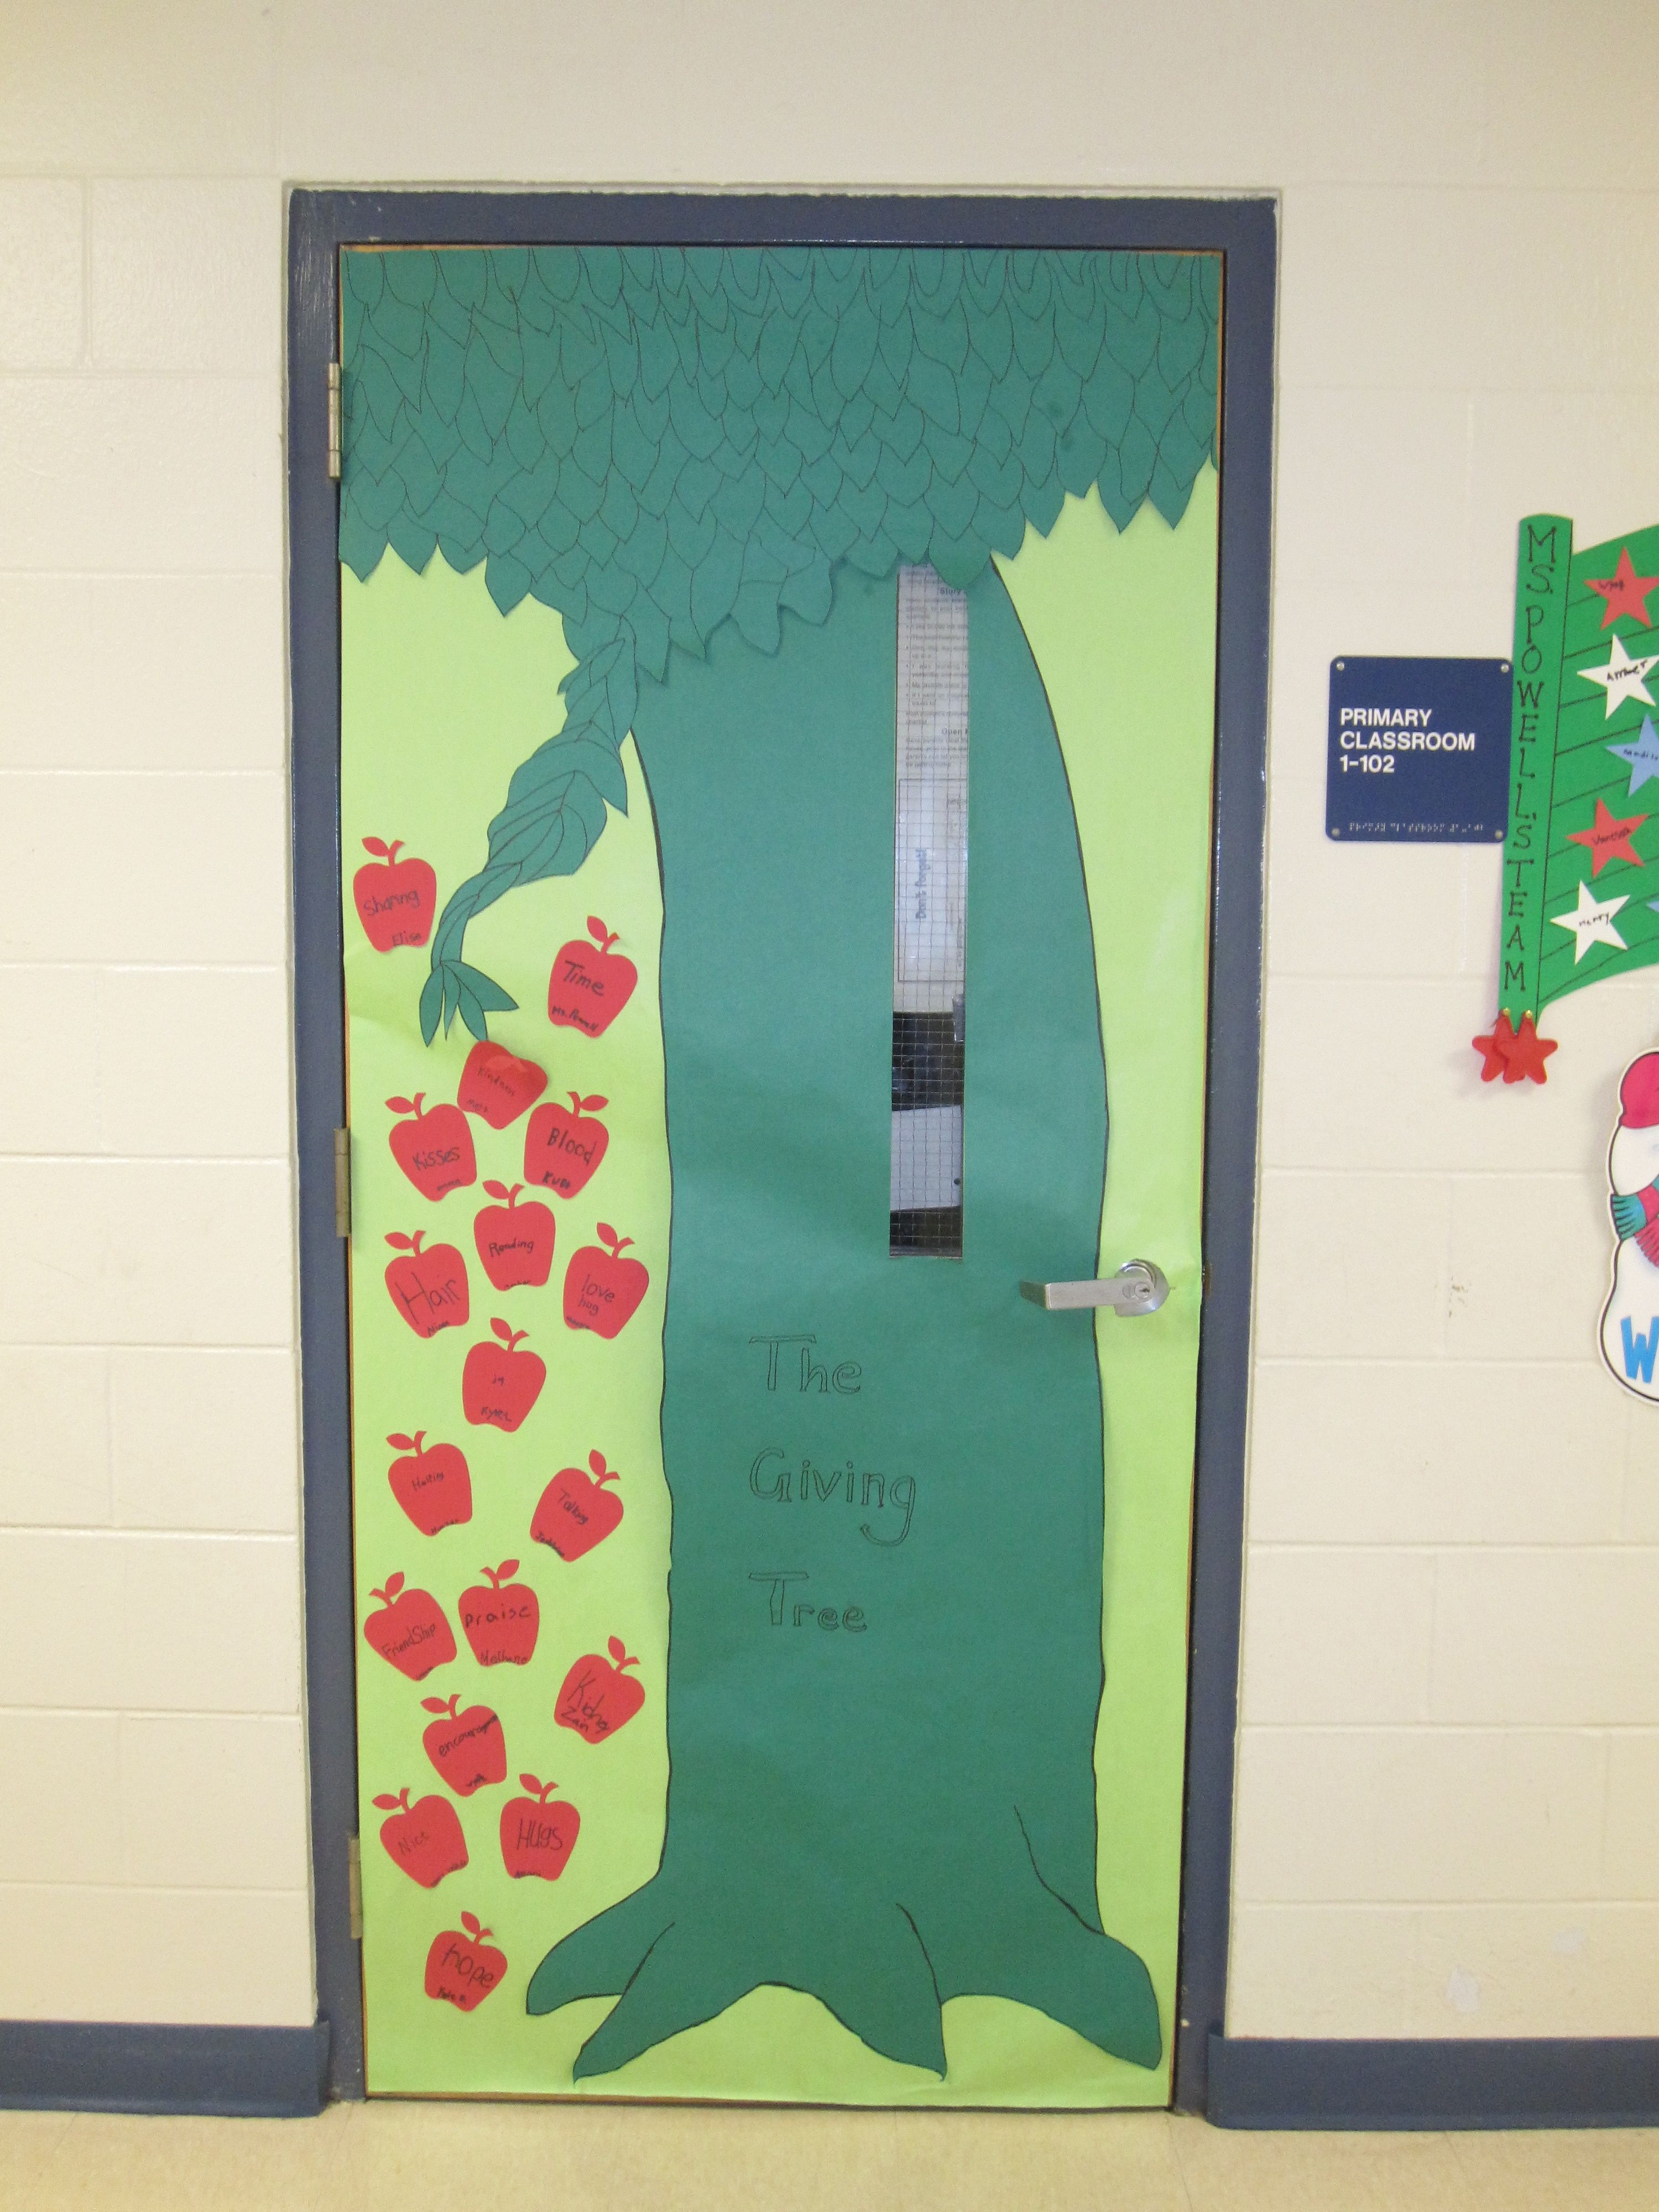 Classroom Door Tree Decoration : The giving tree classroom door ideas for teaching